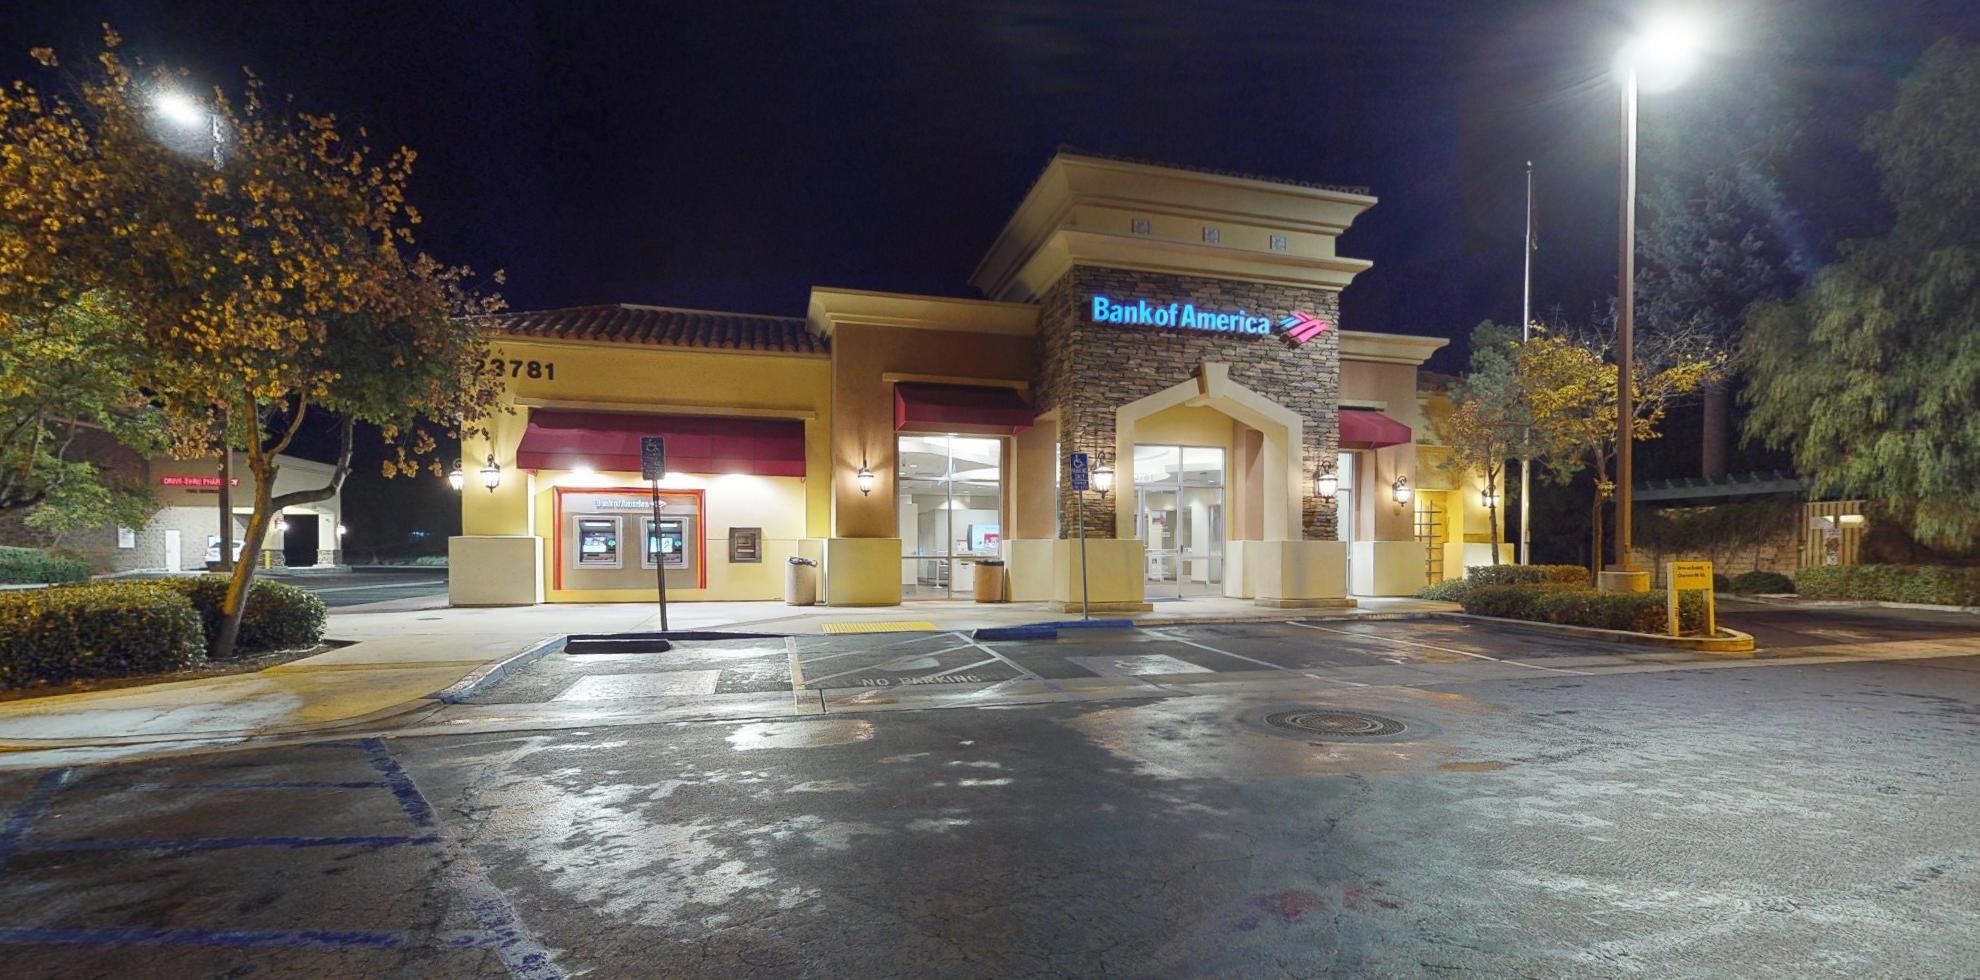 Bank of America financial center with drive-thru ATM | 23781 Washington Ave, Murrieta, CA 92562